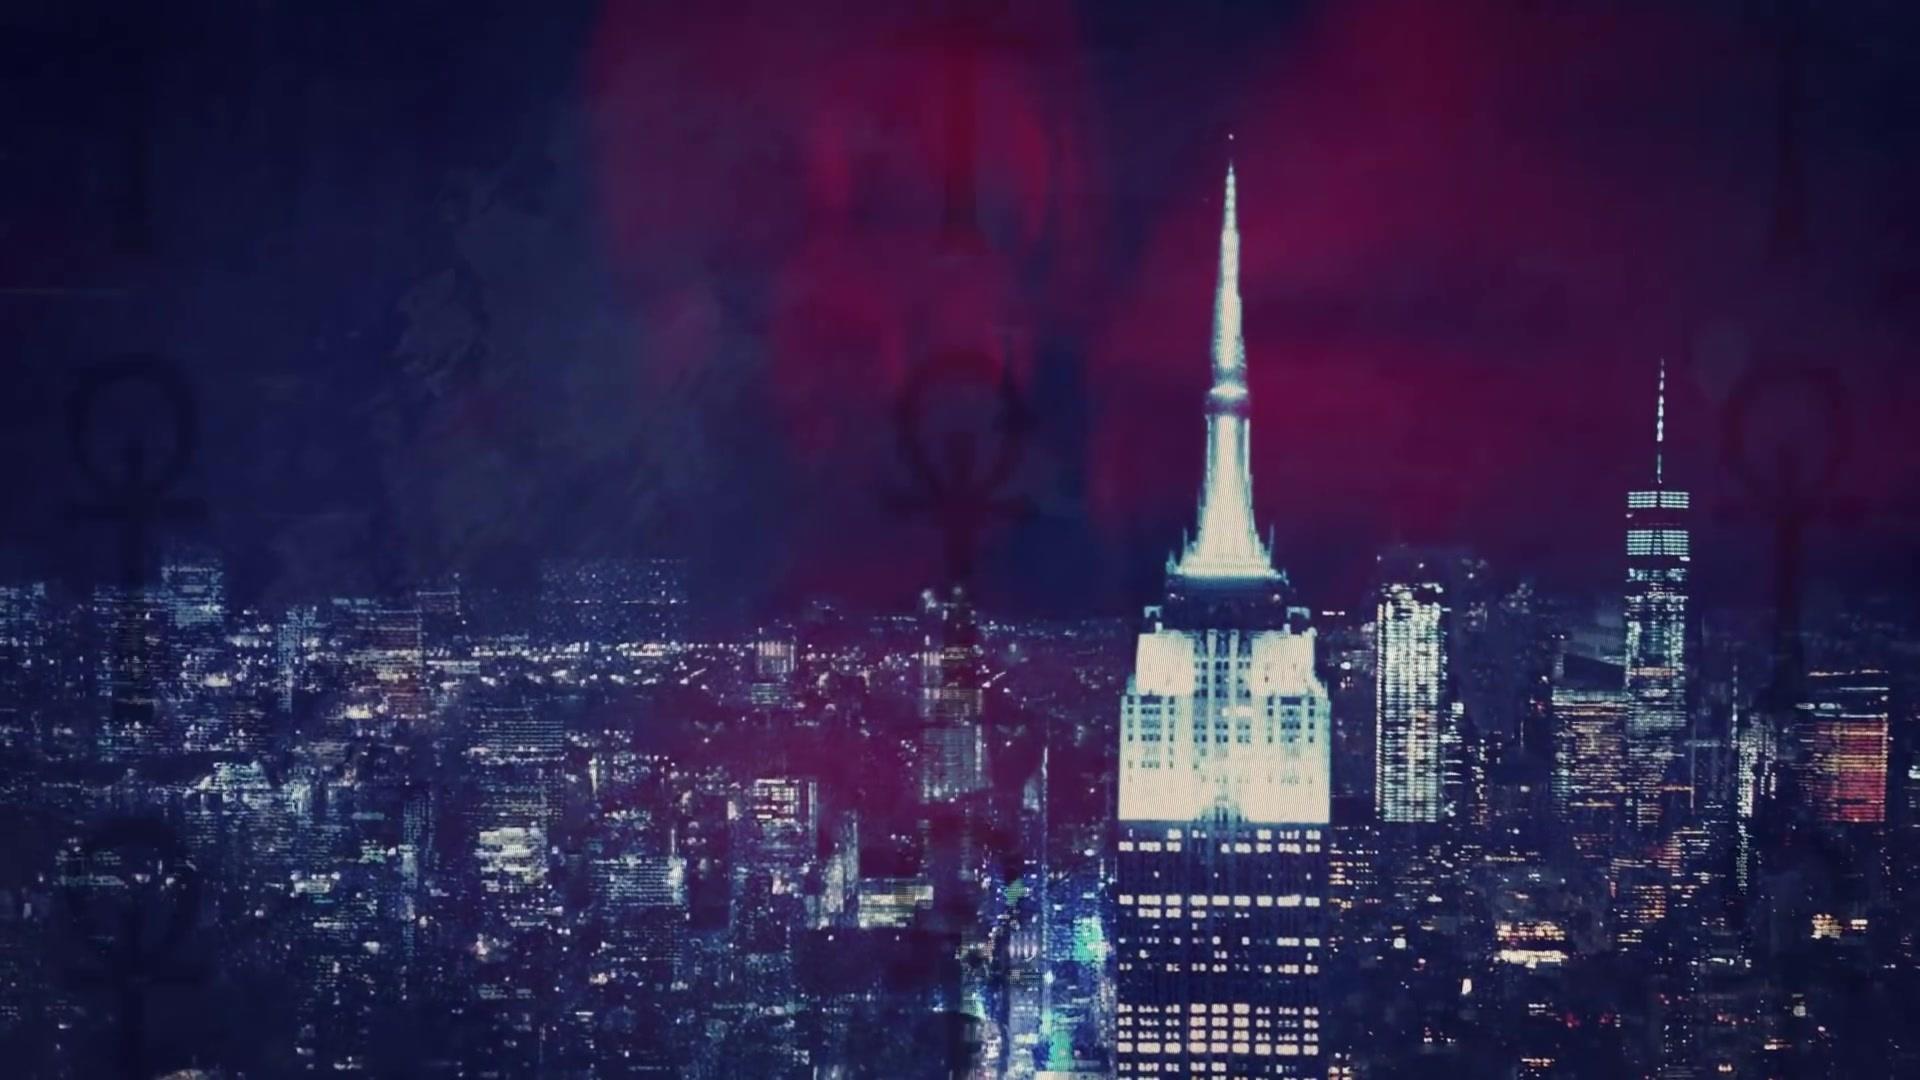 Vampire: The Masquerade - Coteries of New York - E3-Teaser zur interaktiven Story